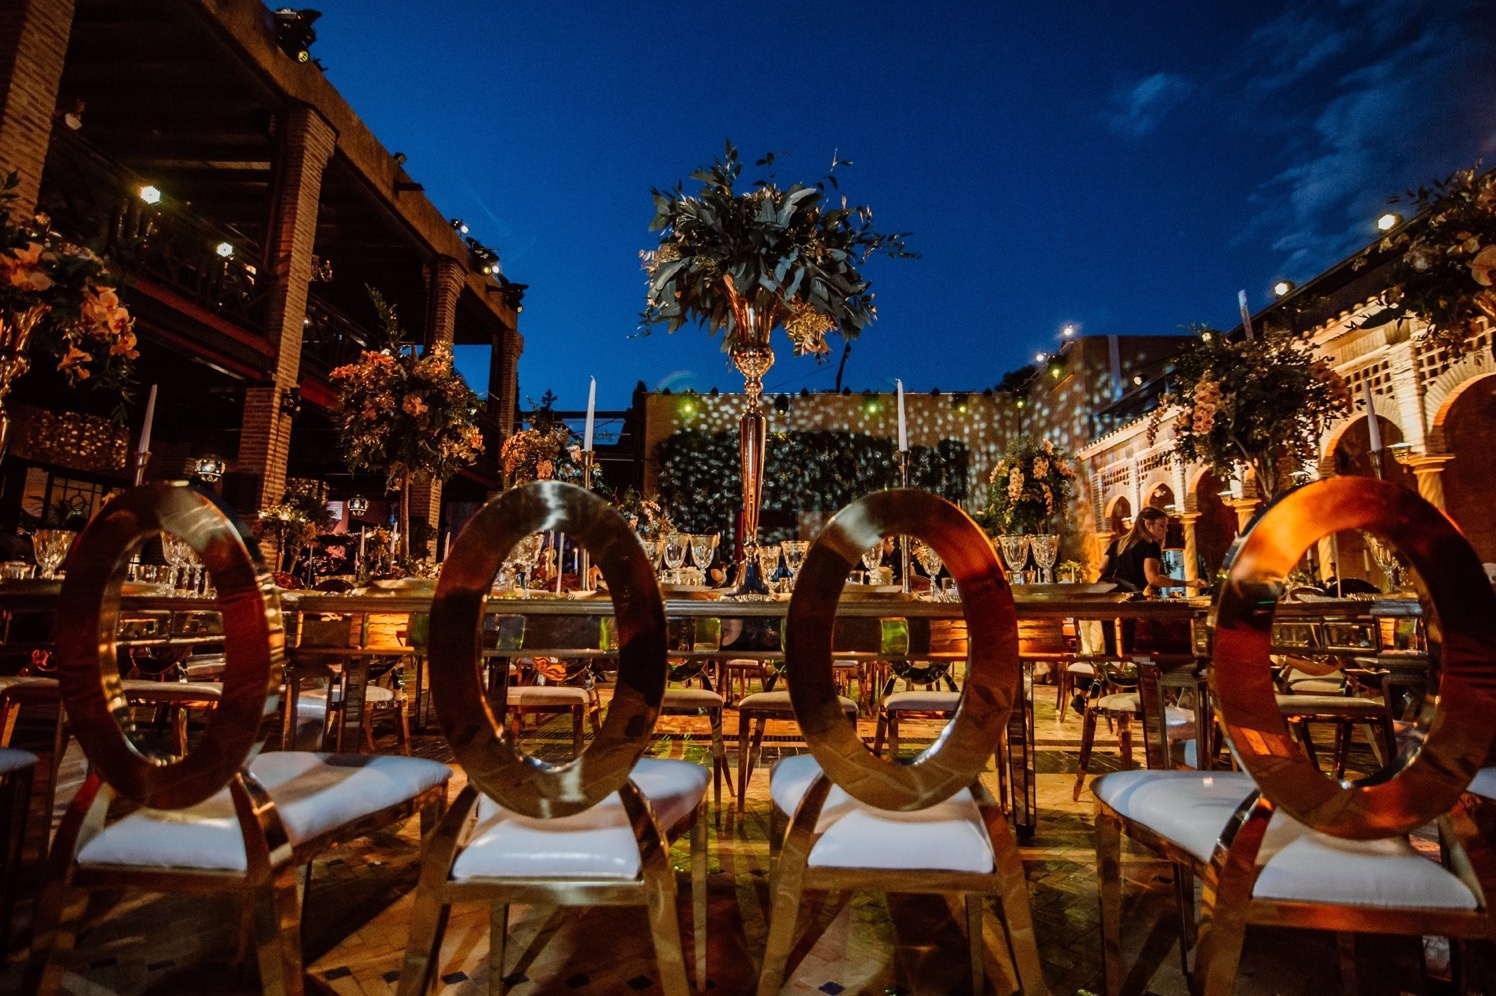 Si-Quiero-Wedding-Planner-By-Sira-Antequera-Bodas-Málaga-Marbella-Miami- L-A-15